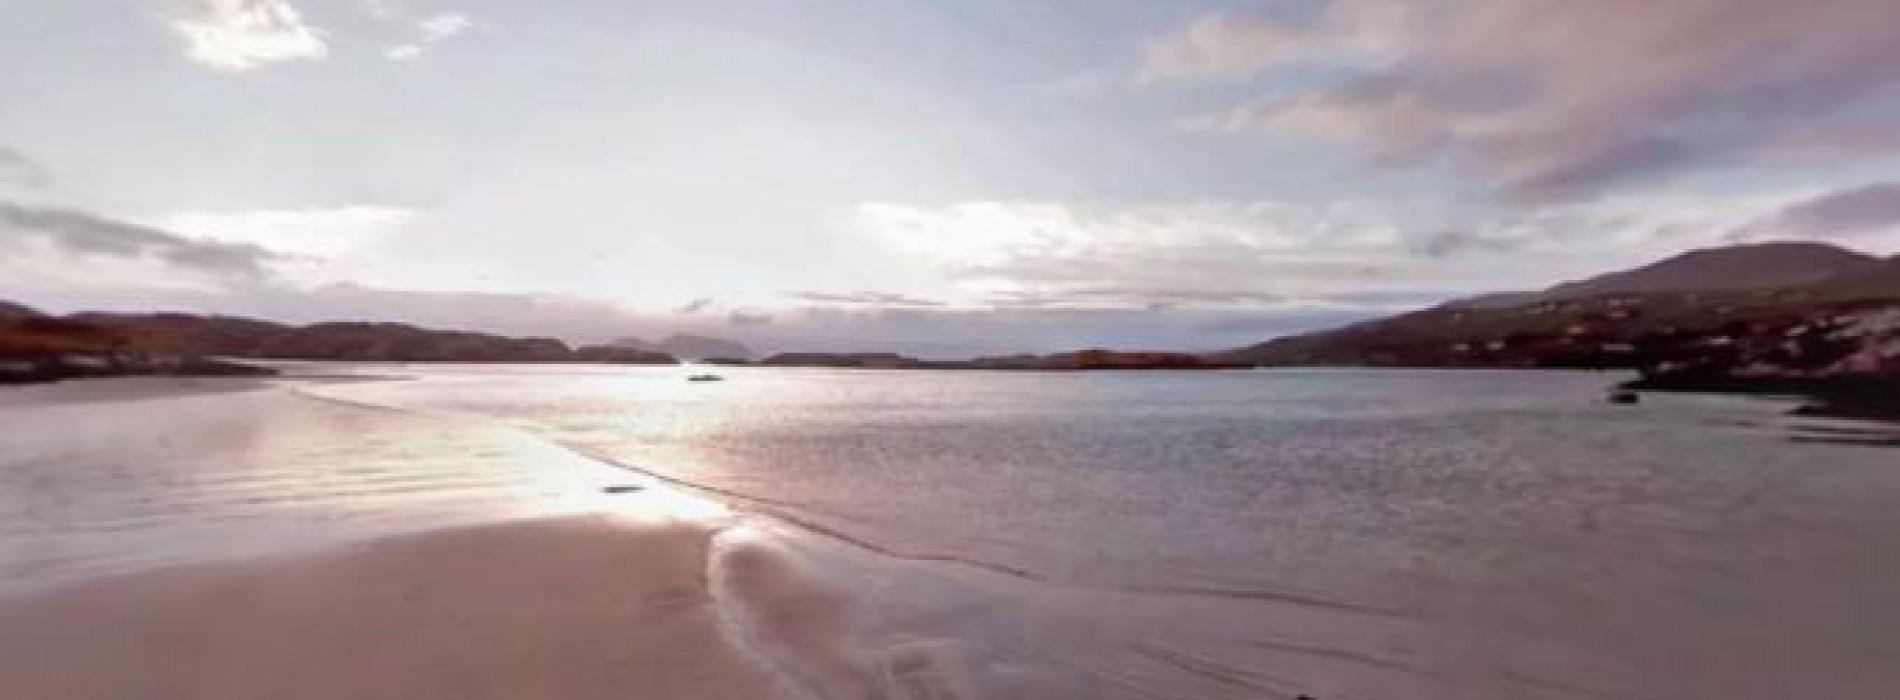 Homesick? Then Visit Ireland via Virtual Reality